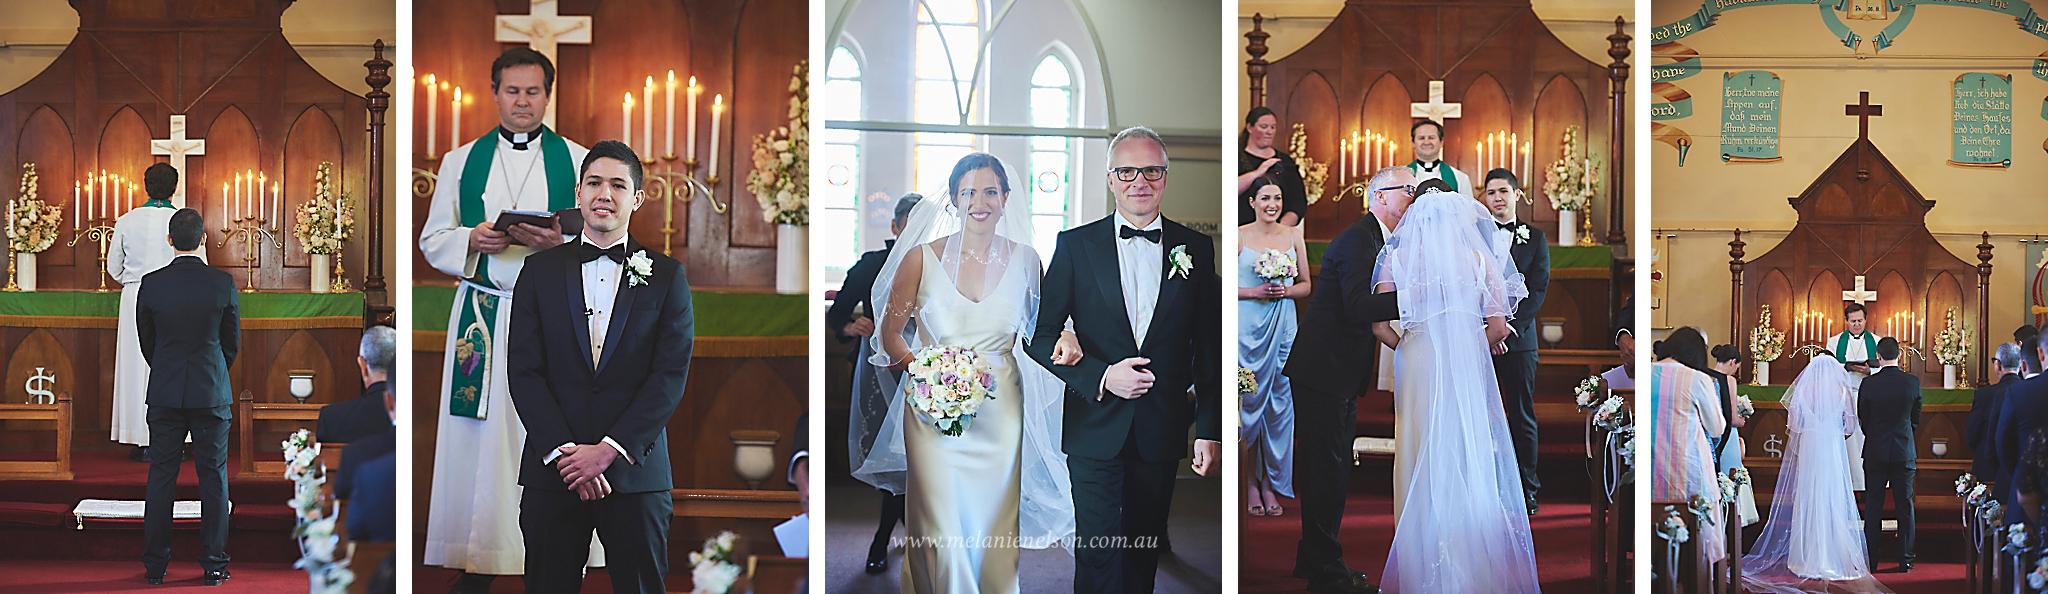 mount_lofty_wedding_0036.jpg